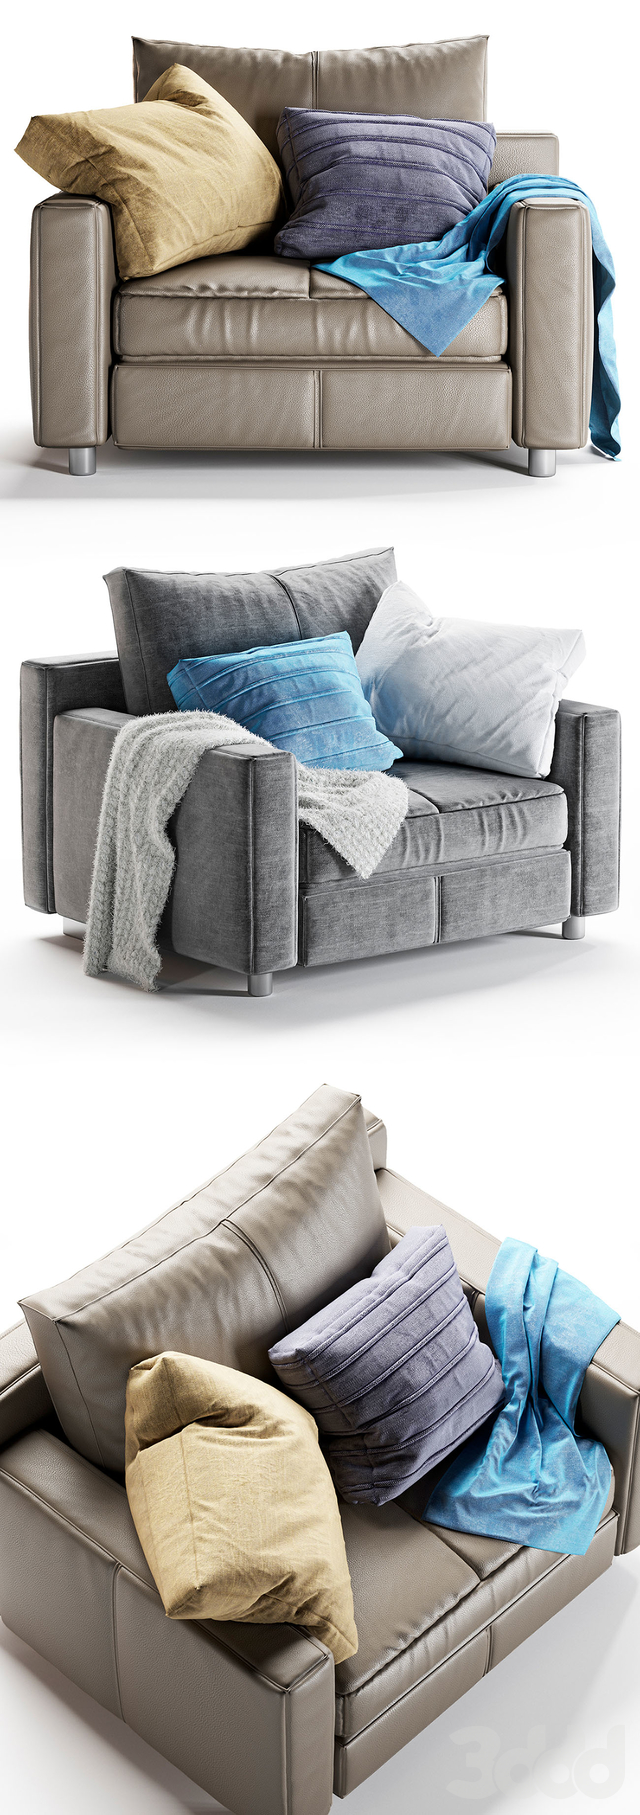 massimosistema armchair